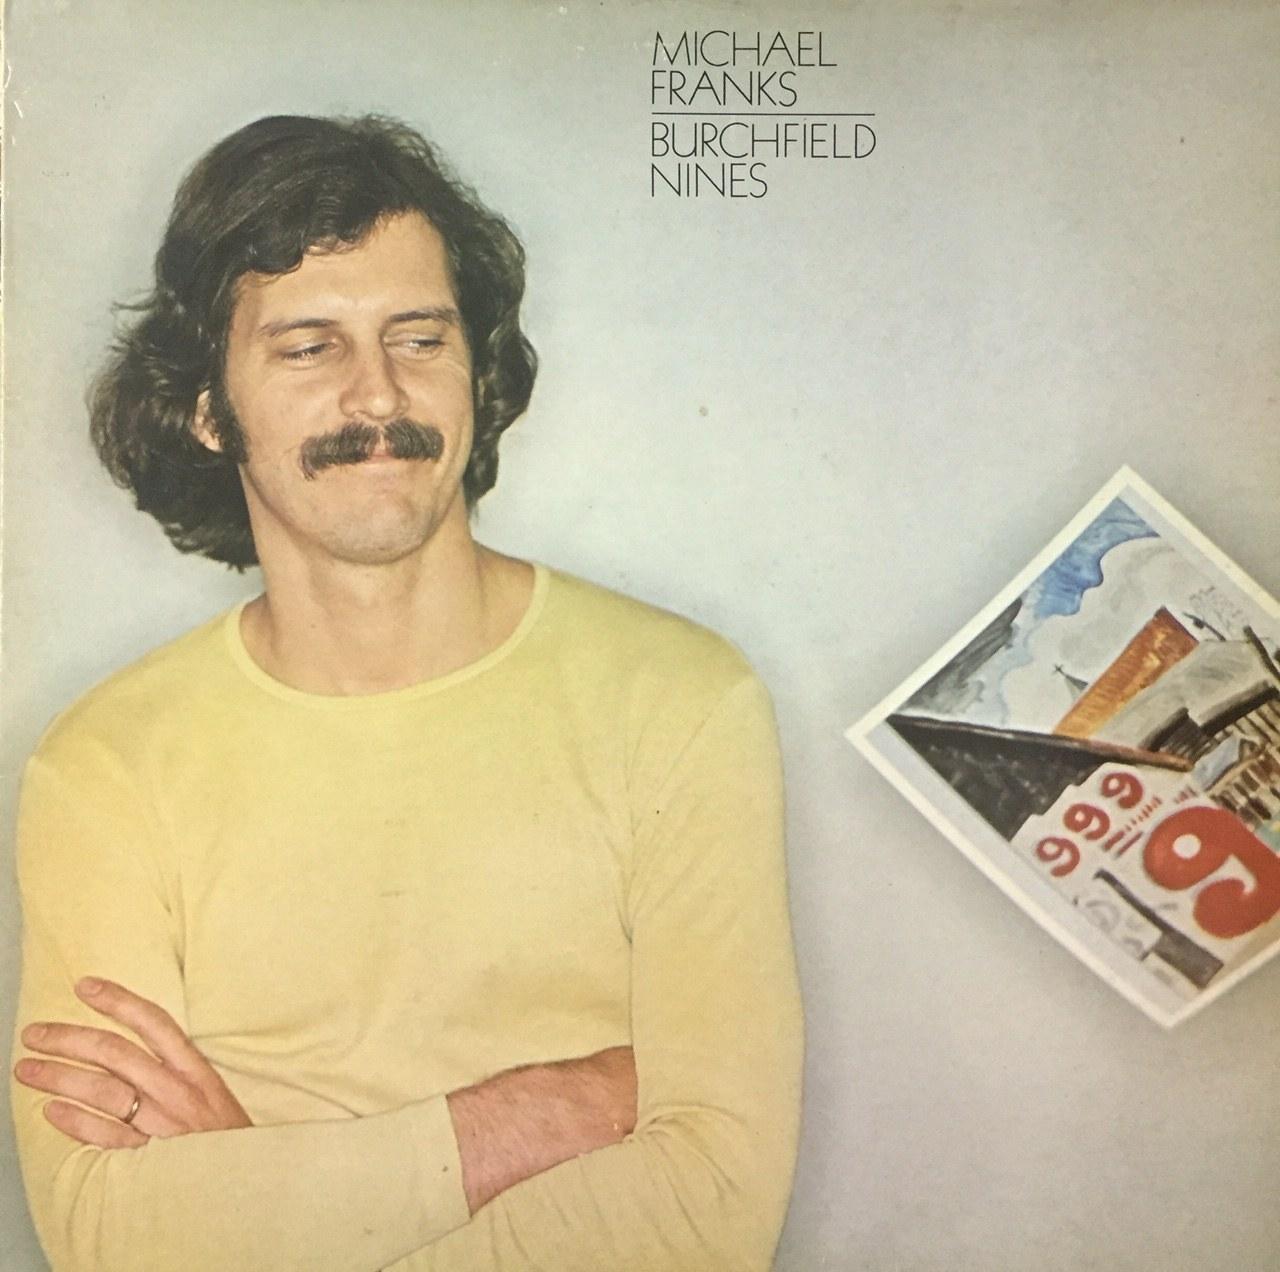 Michael Franks Burchfield Nines